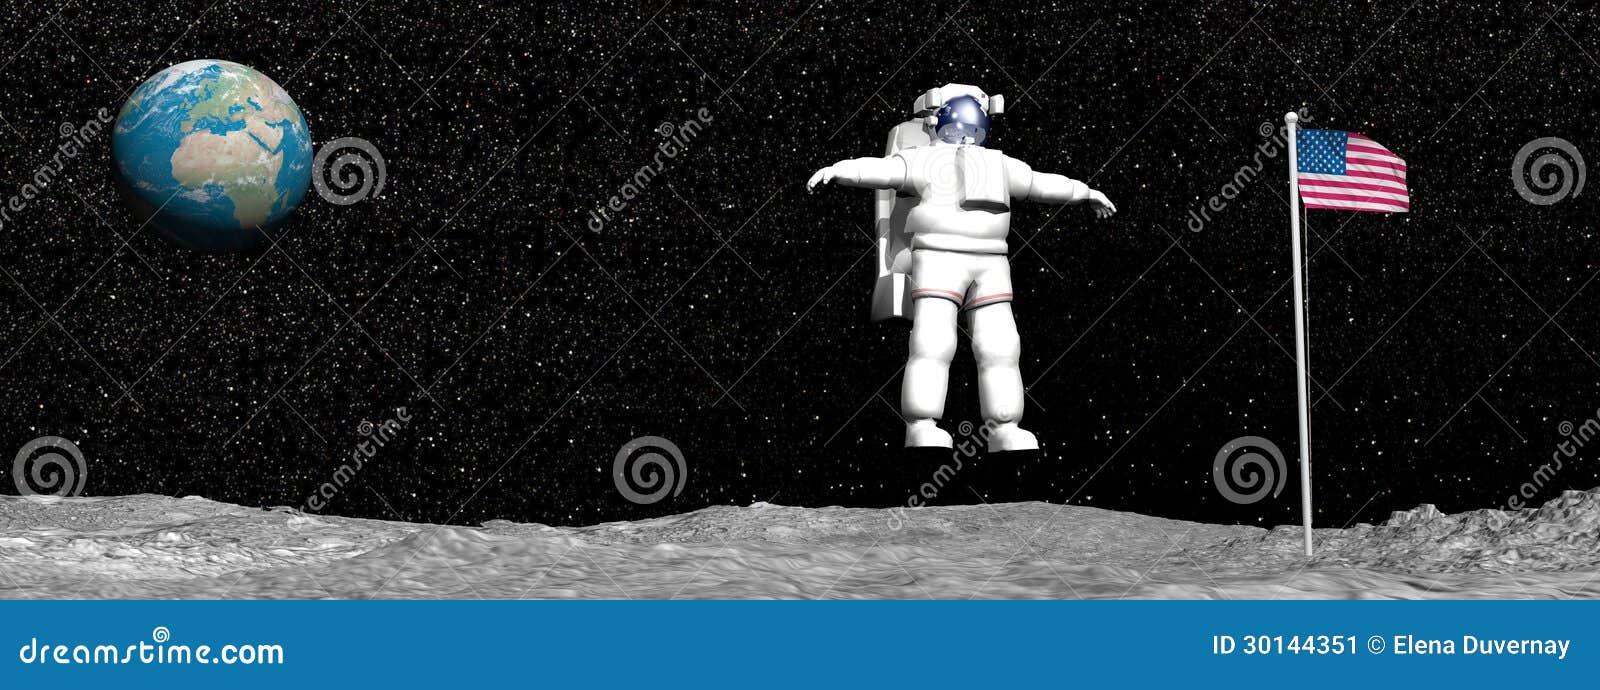 man on the moon mp3 ballyhoo